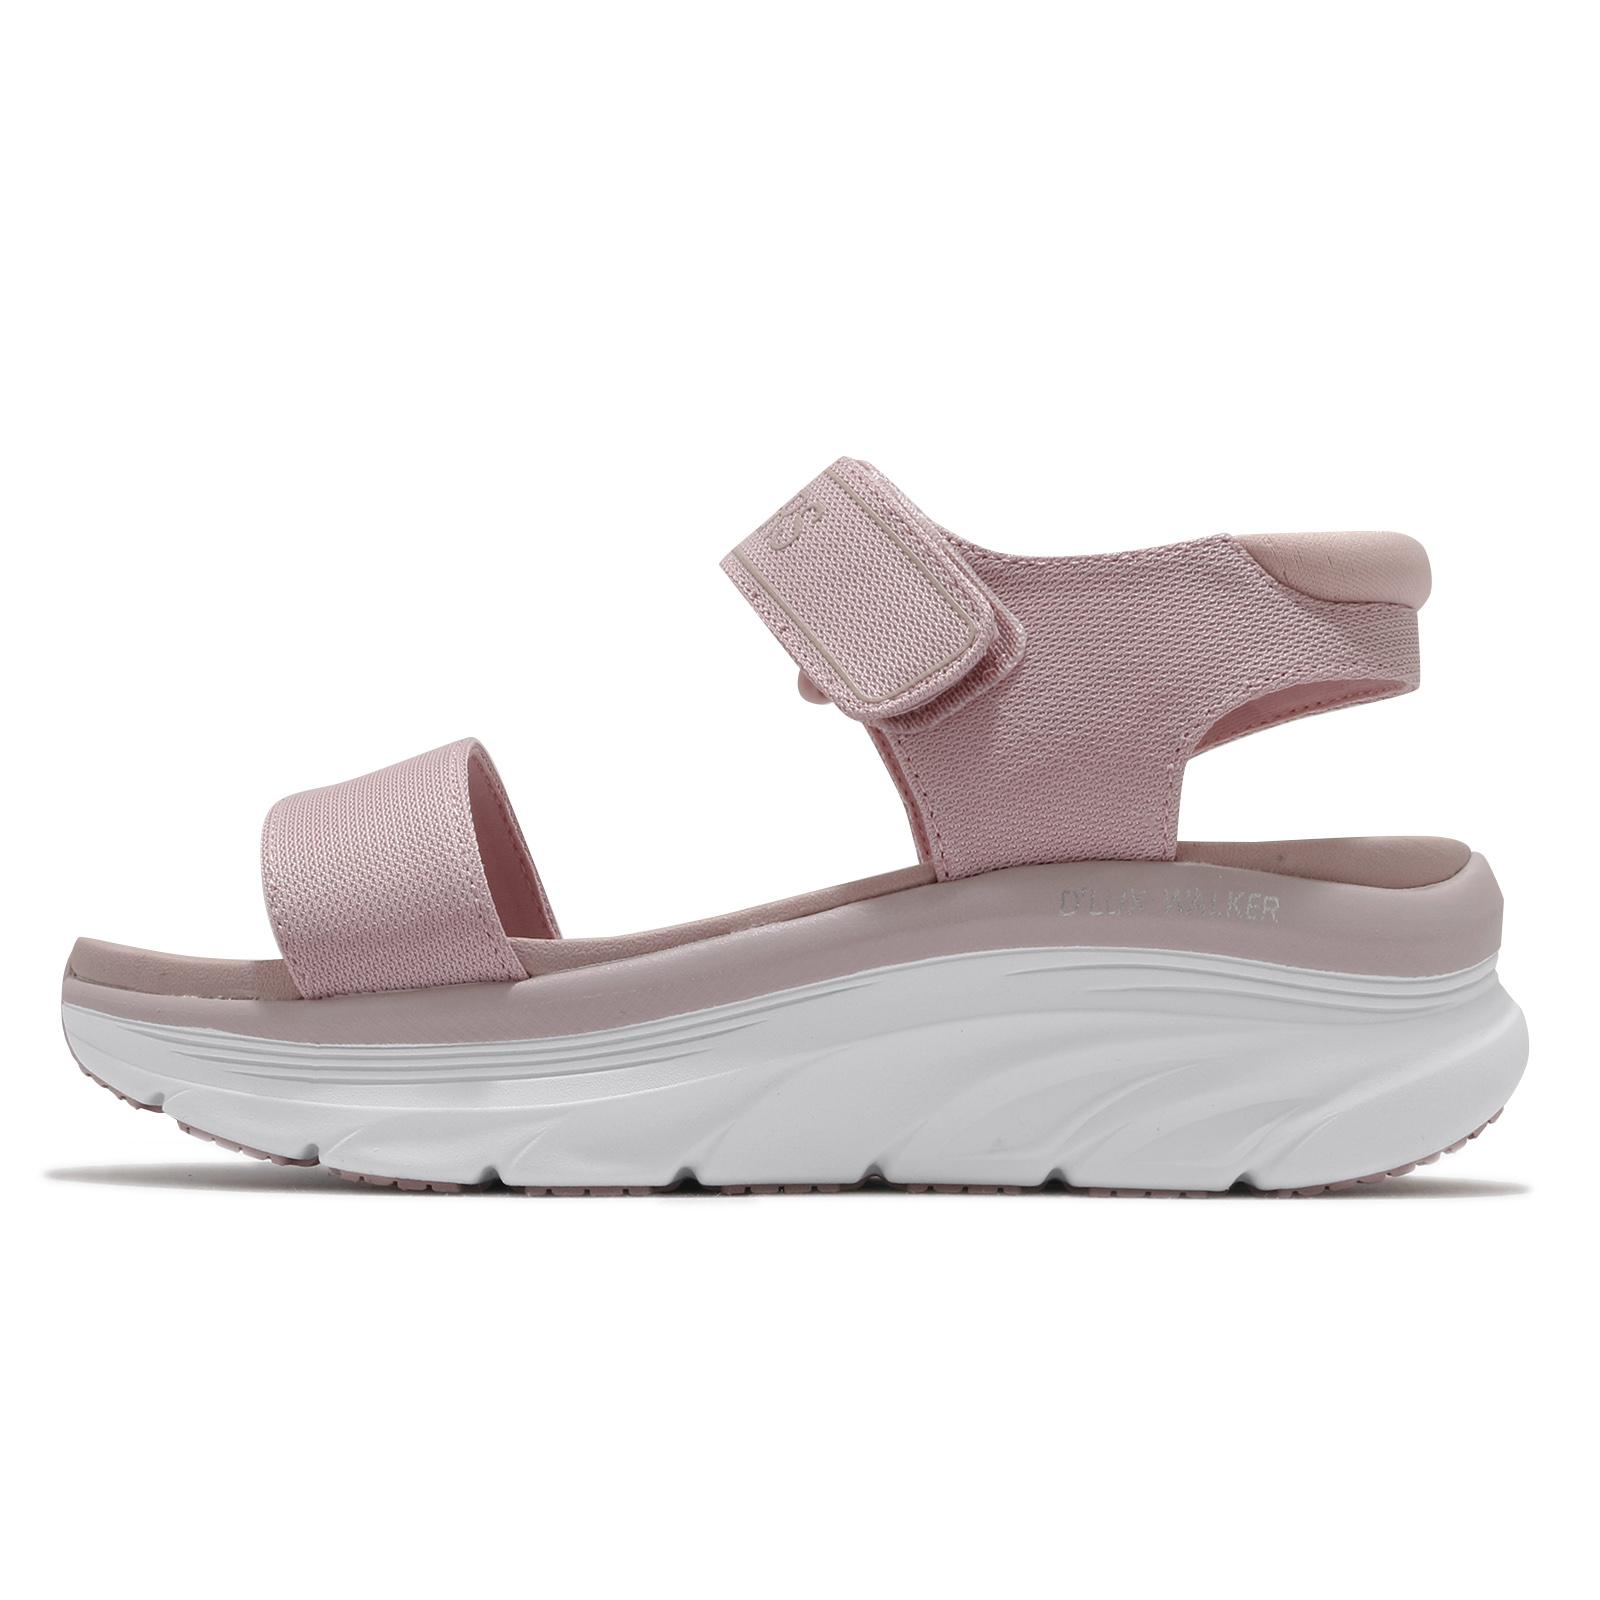 Skechers 涼鞋 D Lux Walker 女鞋 粉 白 魔鬼氈 厚底 增高【ACS】 119226-BLSH